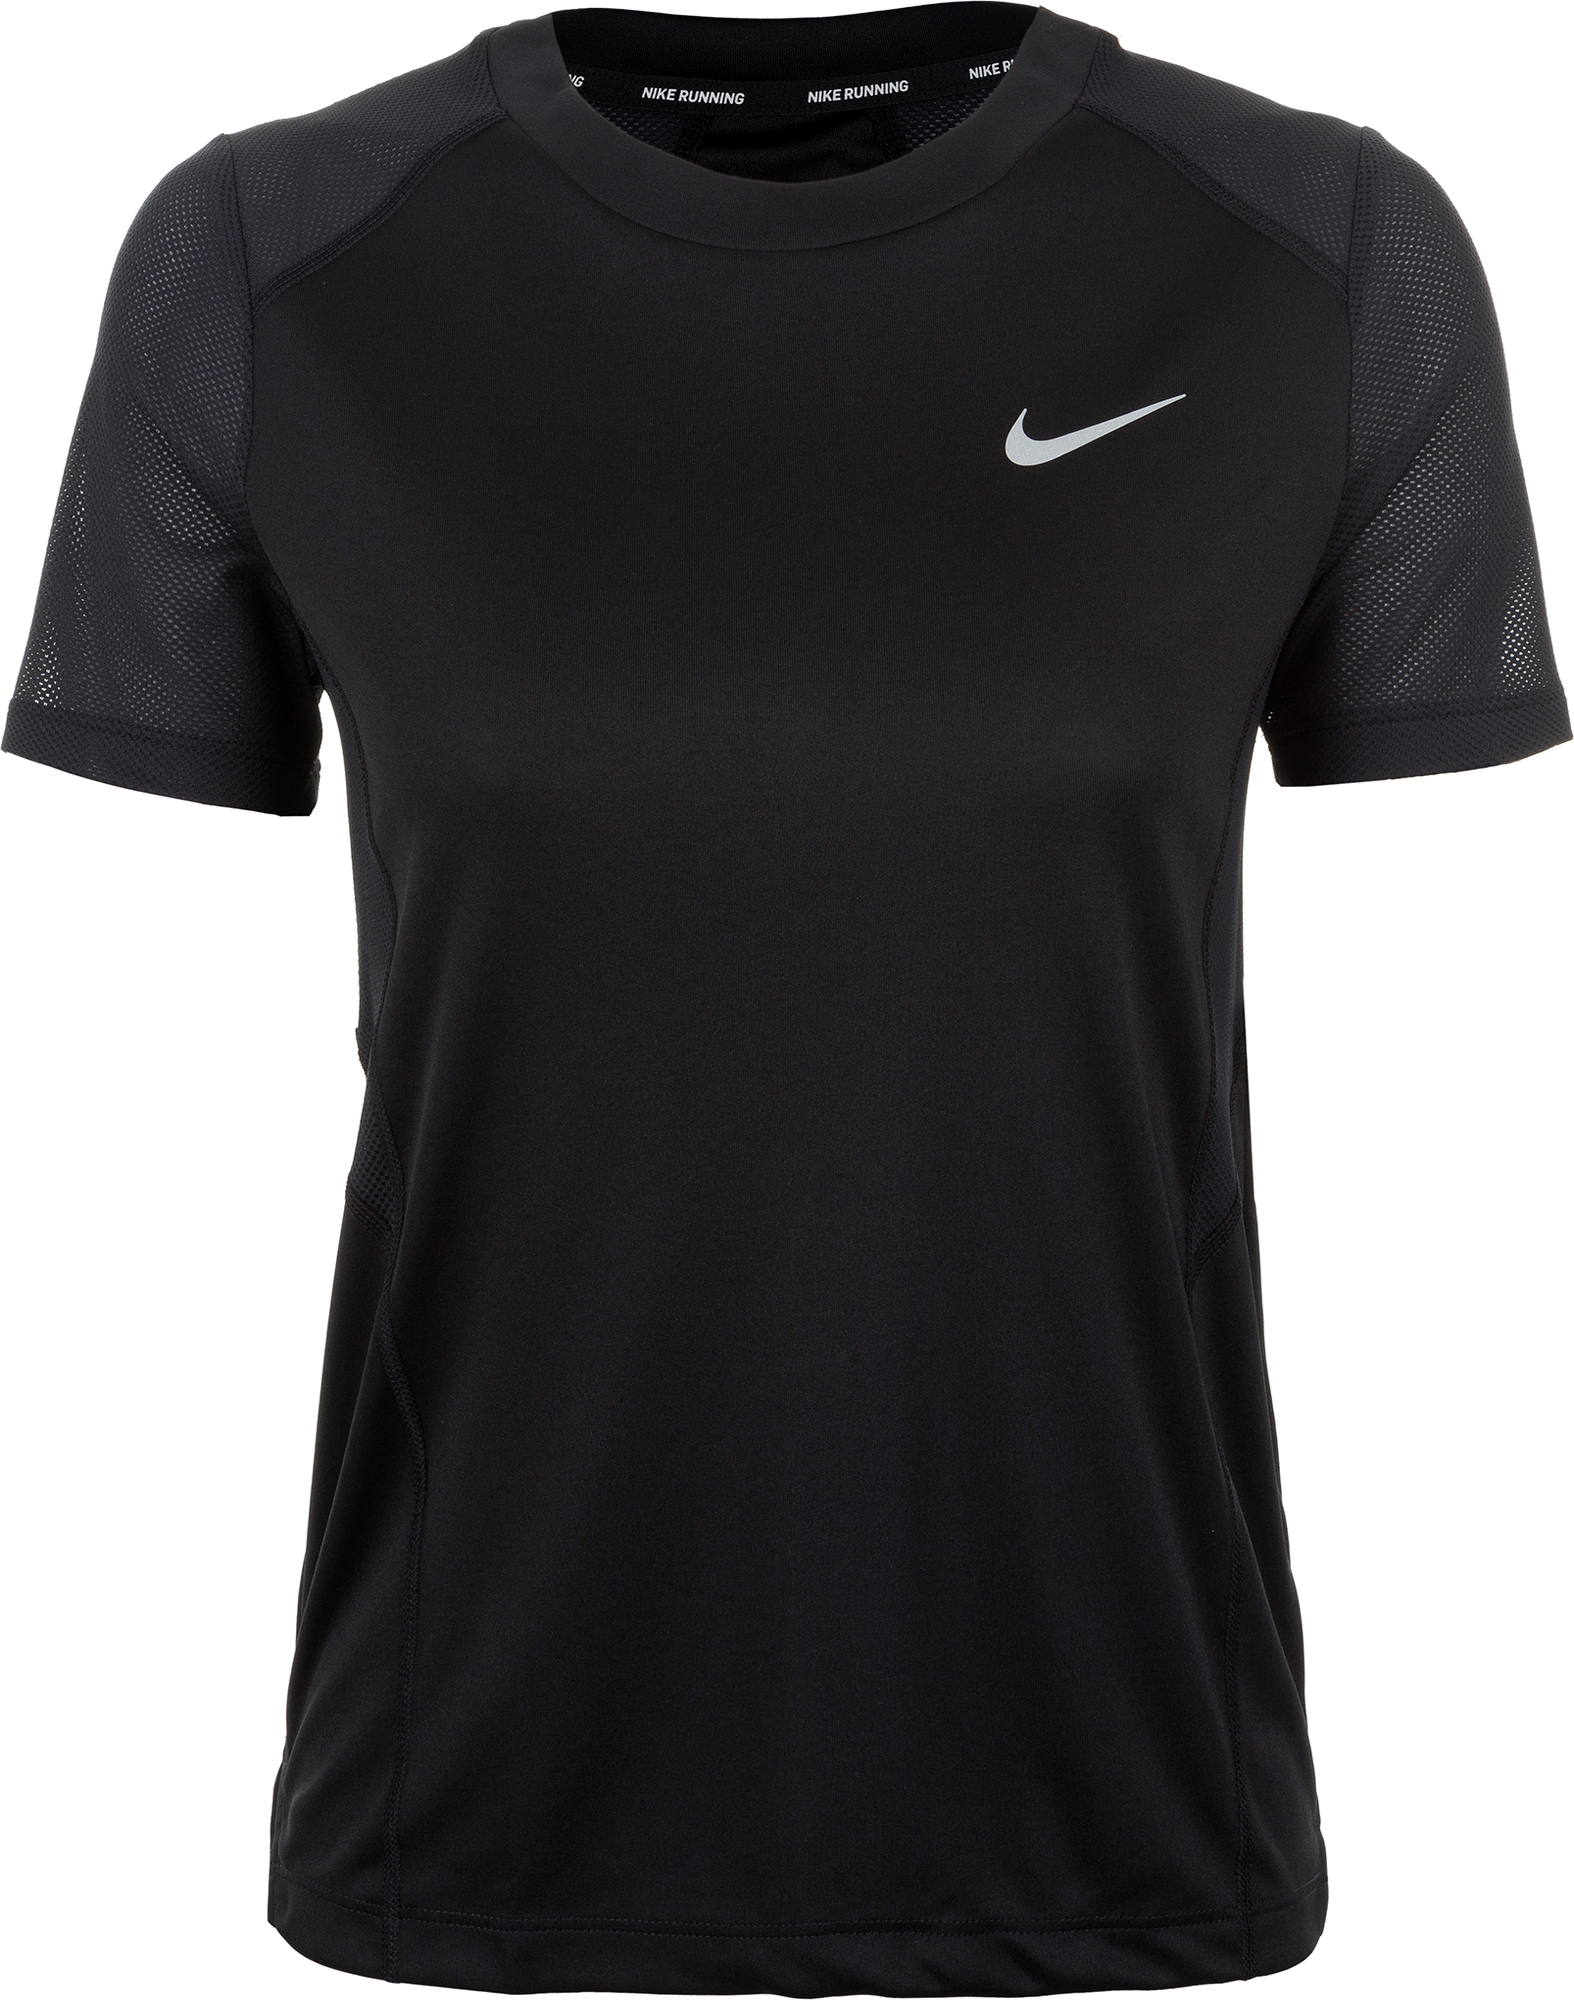 Nike Футболка женская Nike Miler, размер 48-50 nike футболка женская nike miler размер 42 44